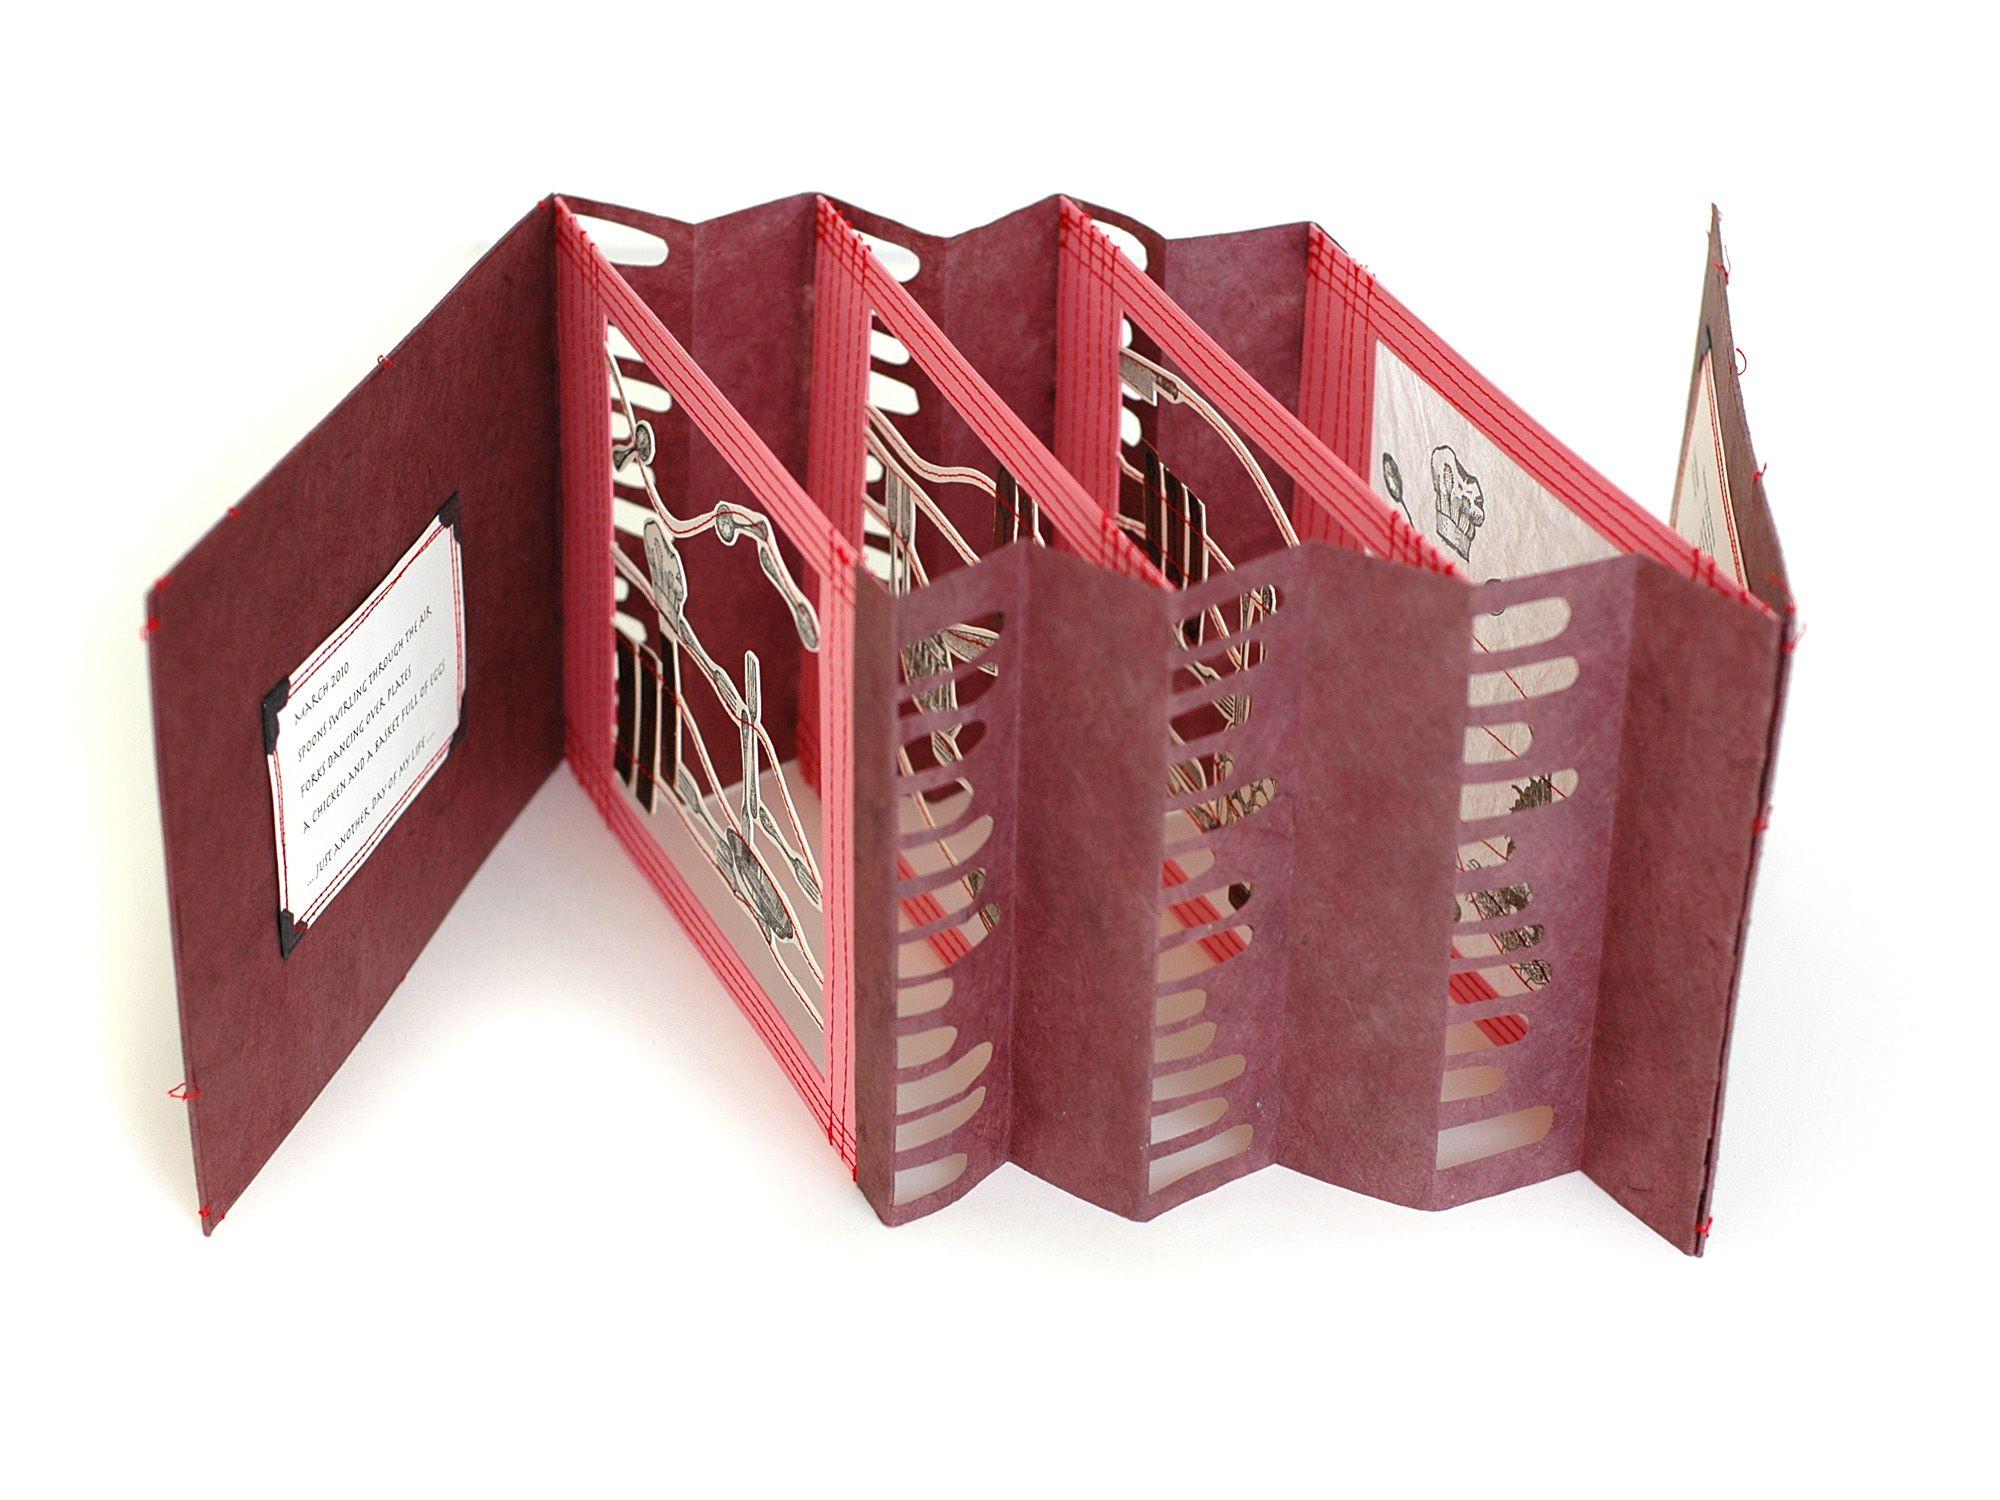 Portfolio Bettina Pauly Bookart And Letterpress Book Art Accordion Book Tunnel Book